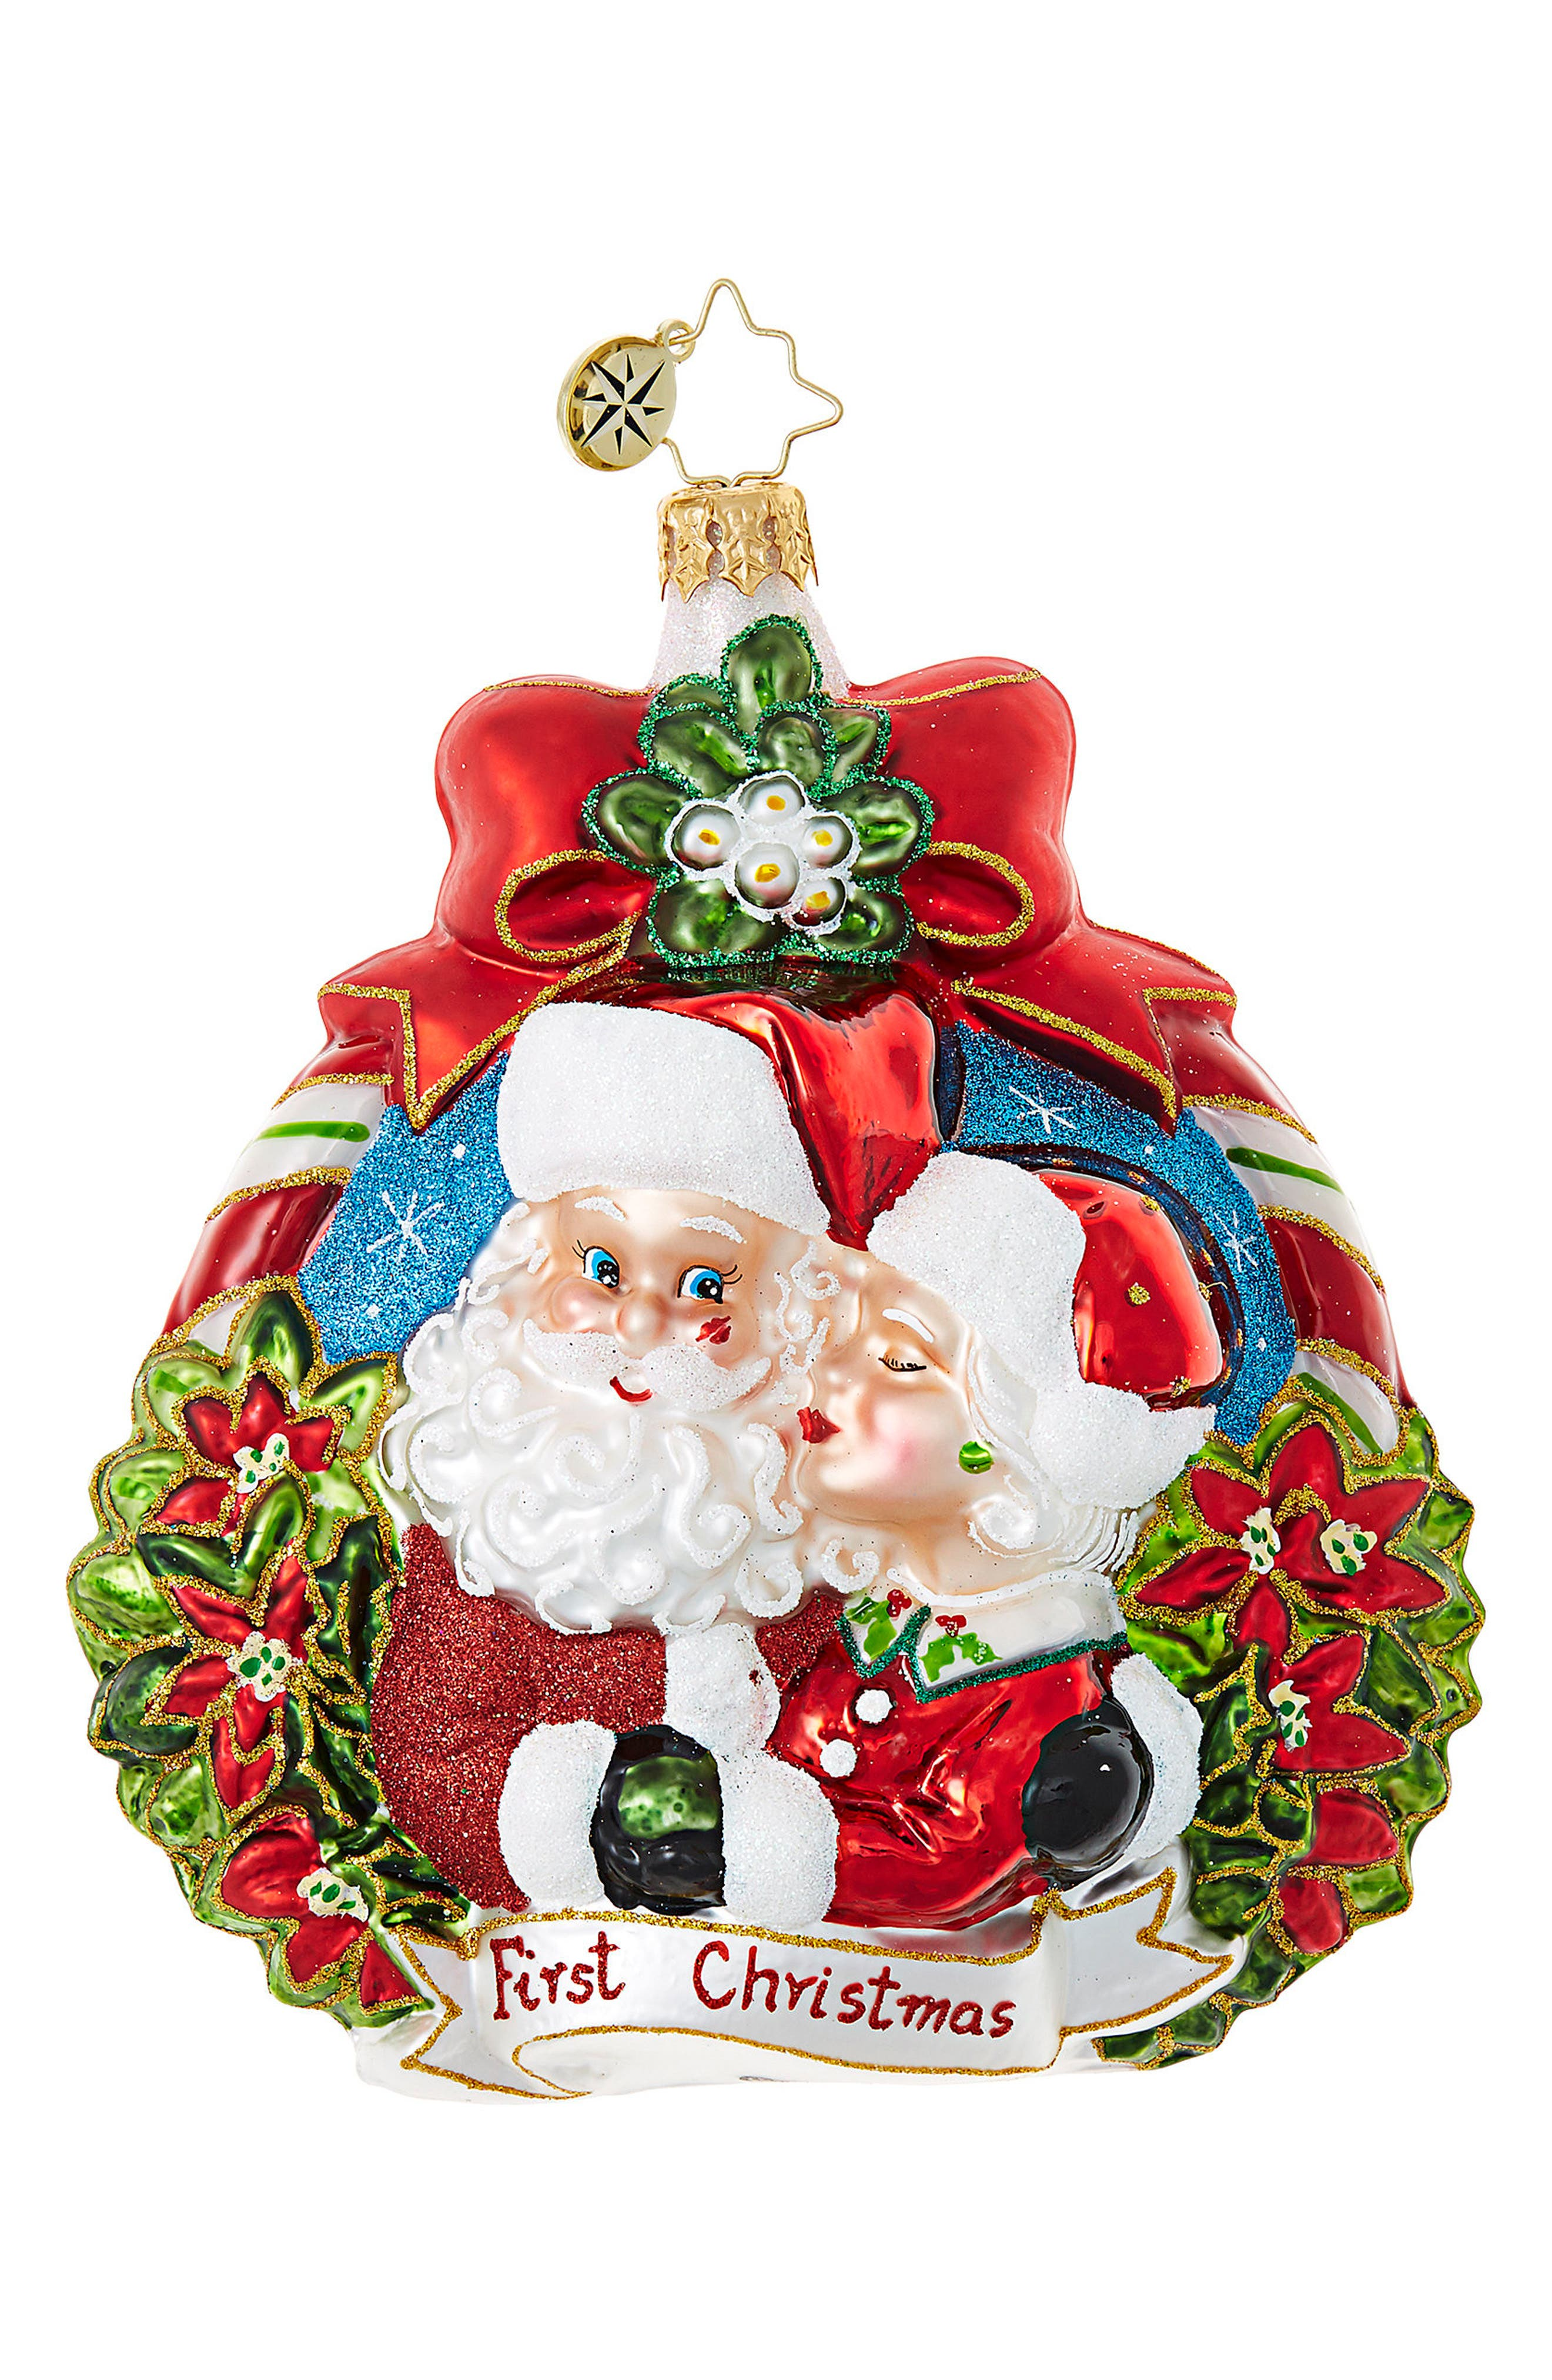 Christmas Ornaments: Christmas Trees & Home | Nordstrom